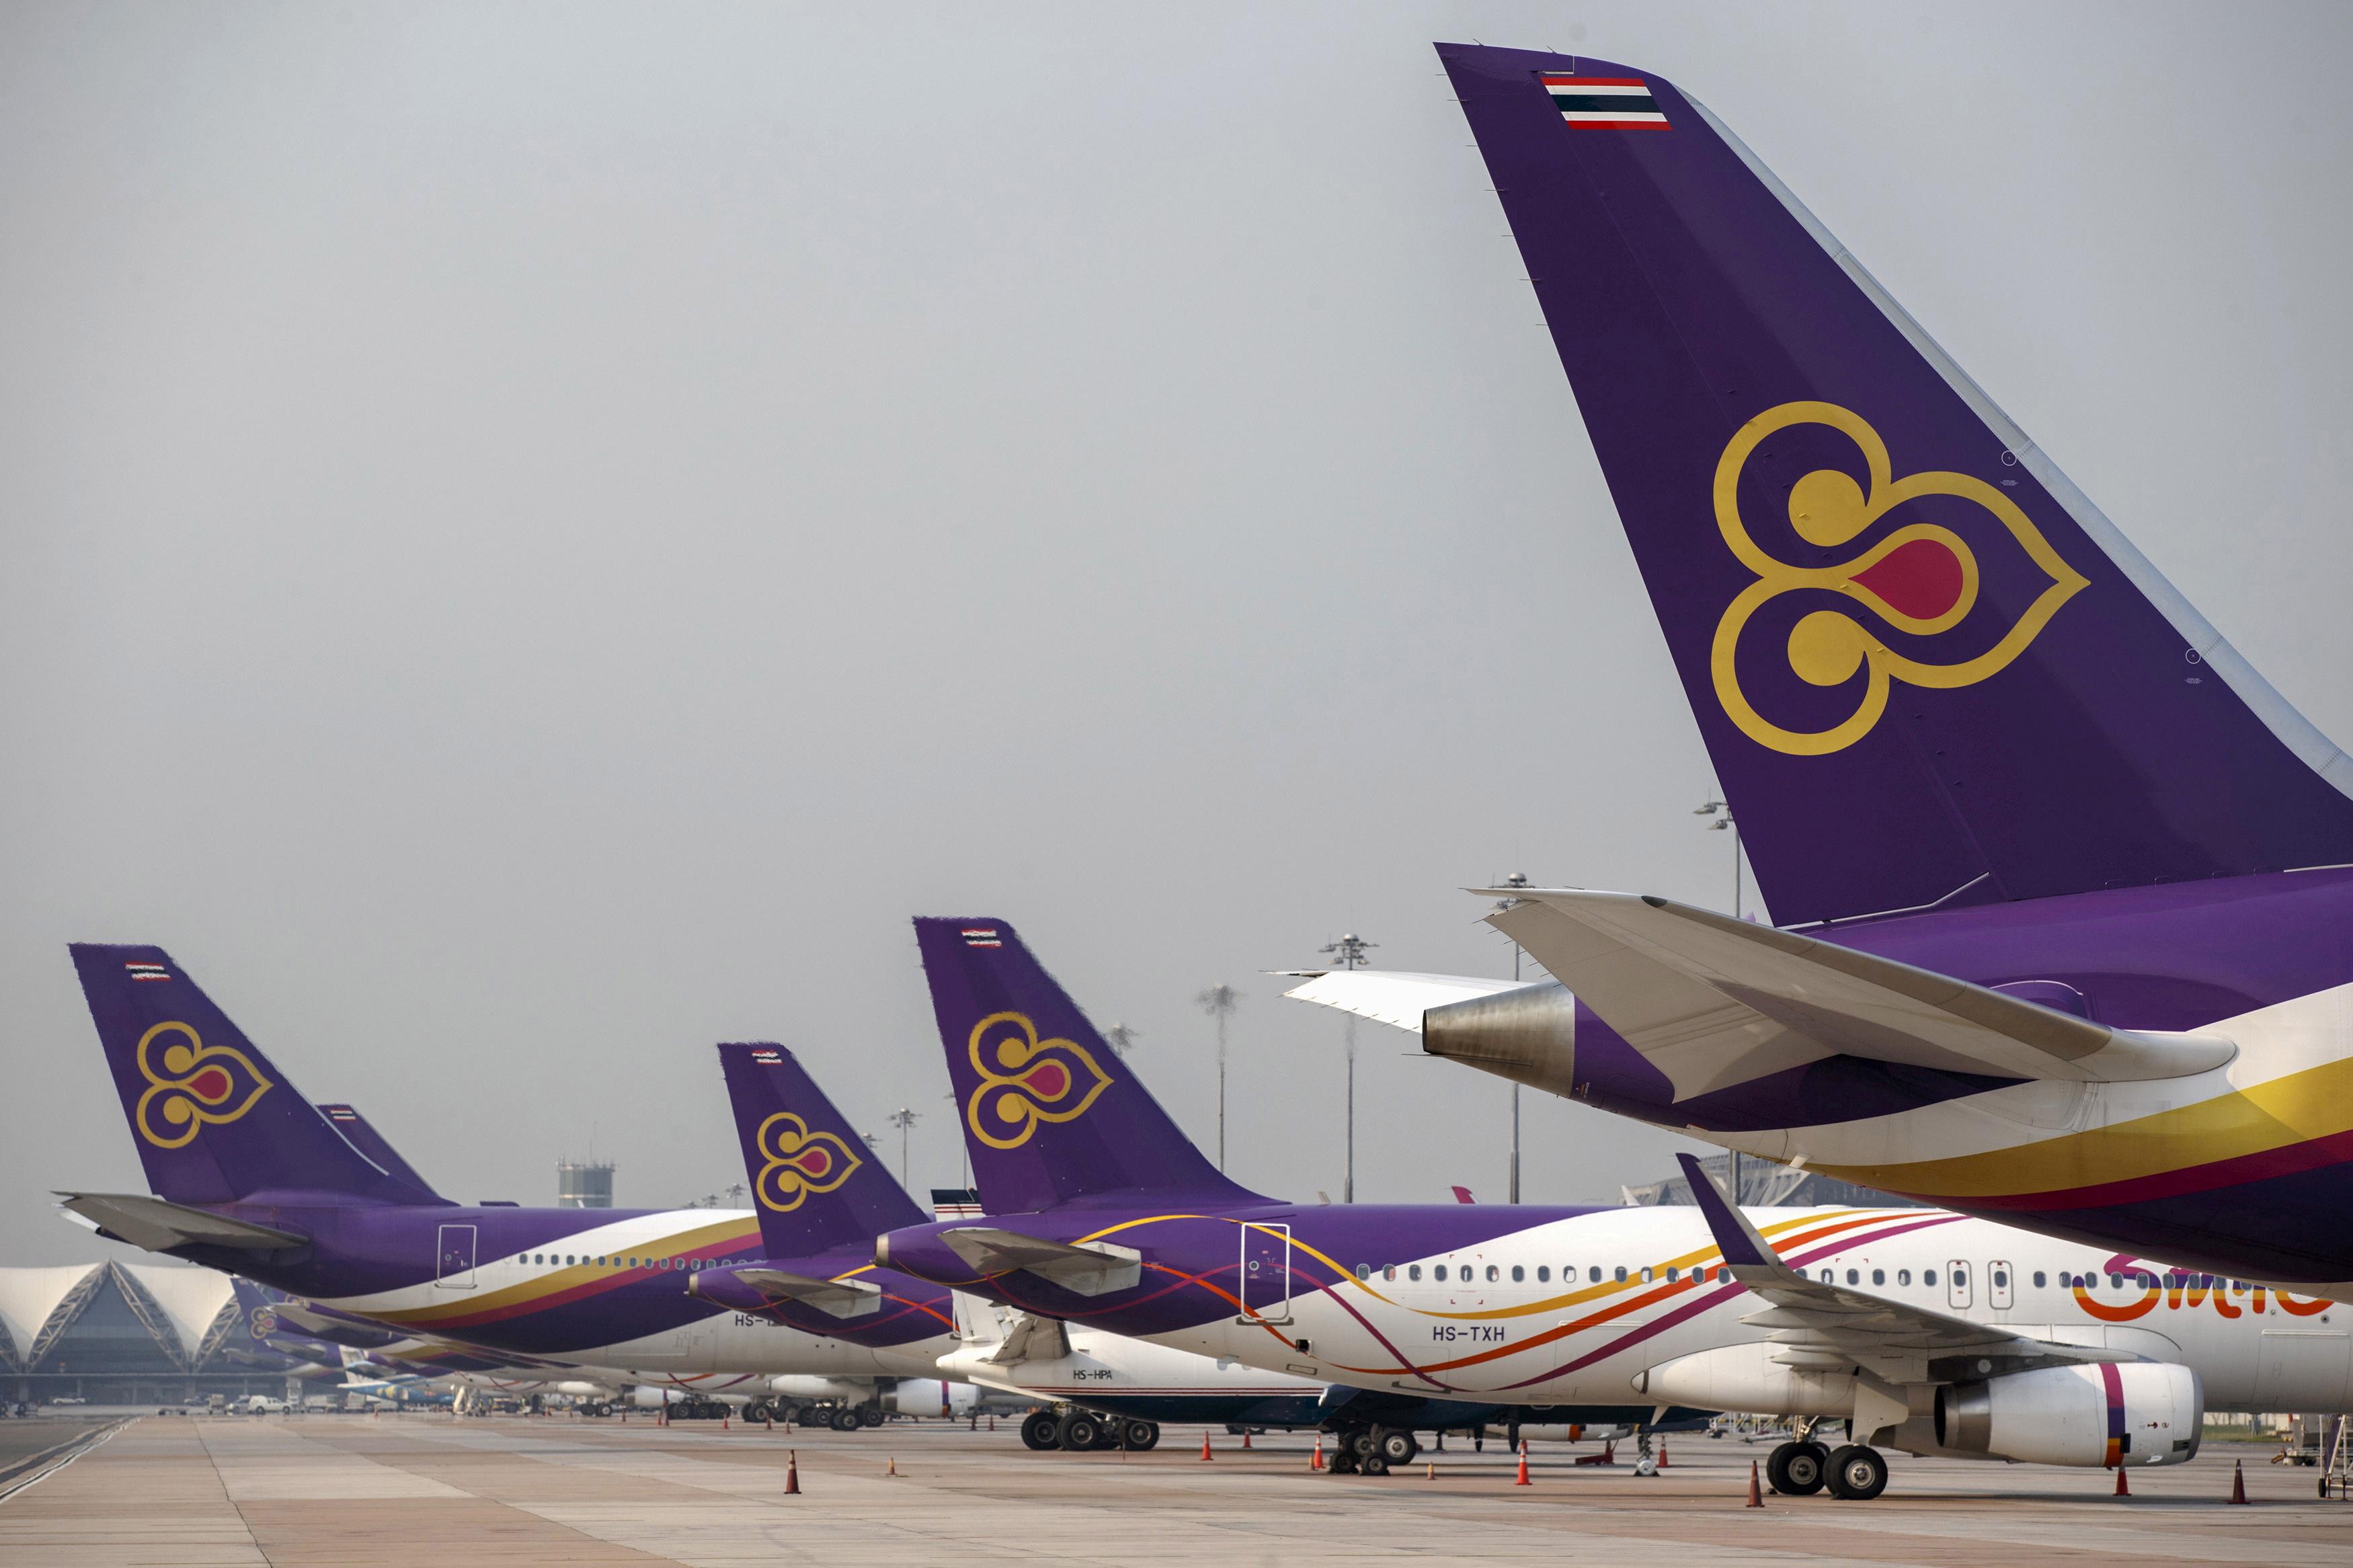 Thai Airways aircraft are parked on the tarmac at Bangkok's Suvarnabhumi International Airport March 27, 2015.  REUTERS/Athit Perawongmetha/File Photo